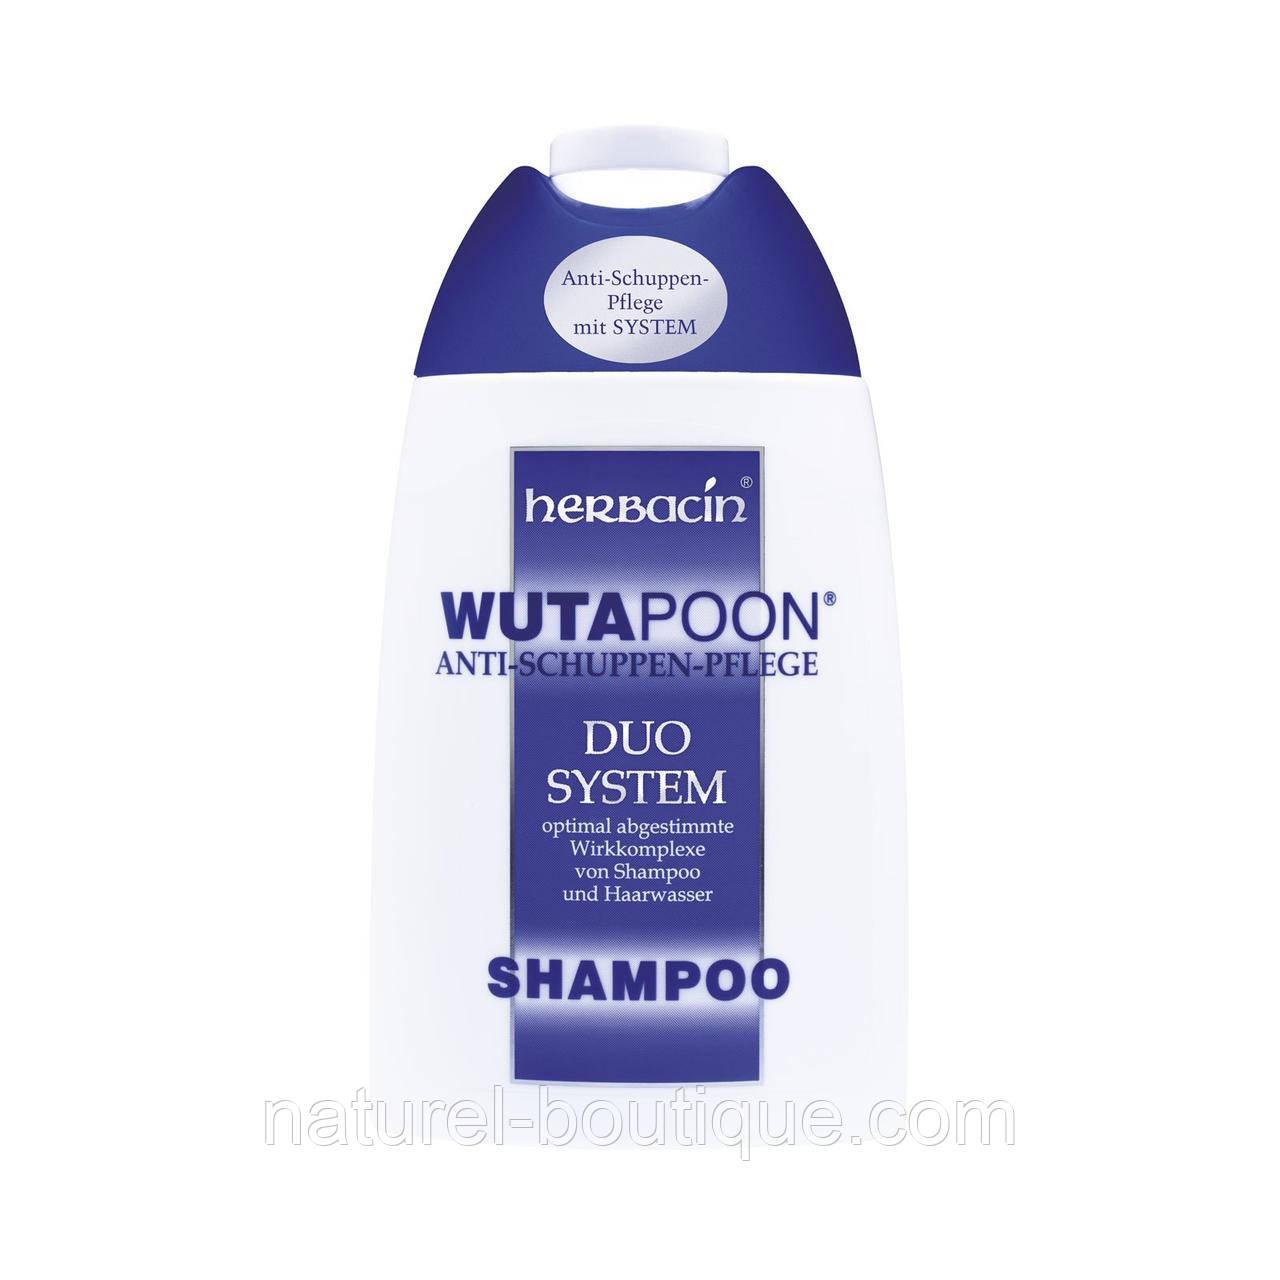 Шампунь Herbacin WUTAPOON - Dandruff Treatment против перхоти